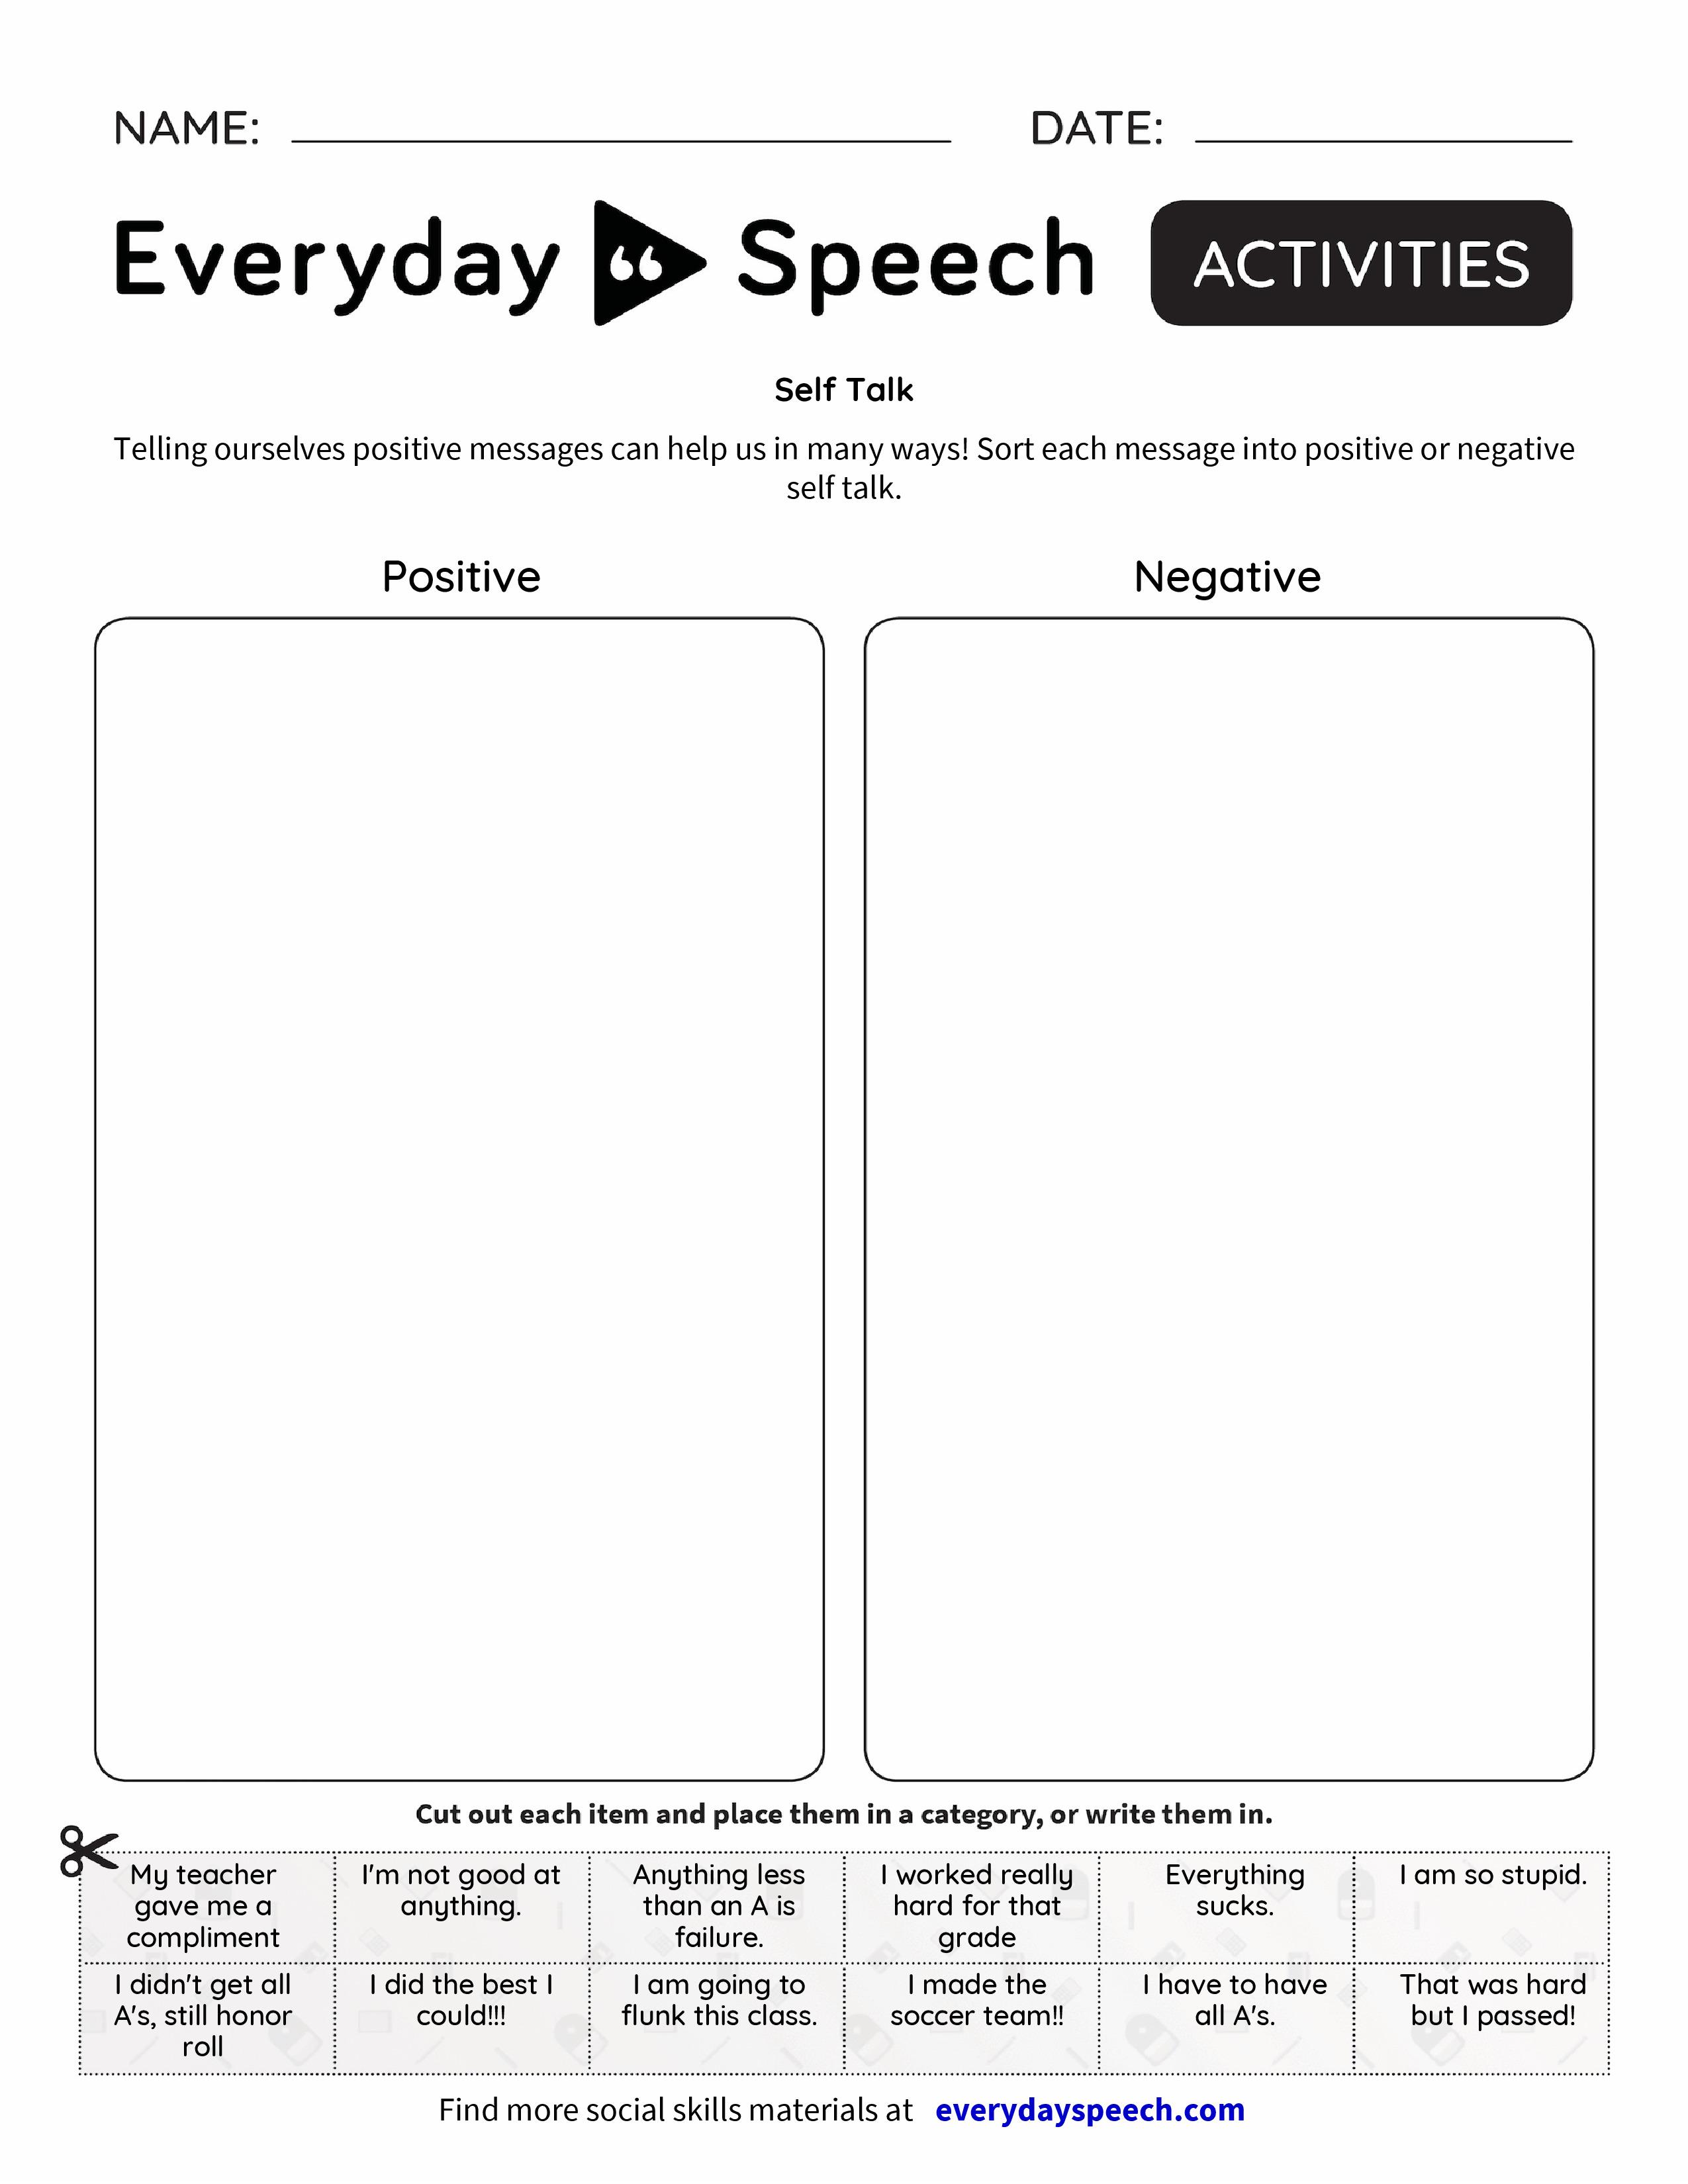 worksheet Negative Self Talk Worksheet self talk everyday speech preview preview